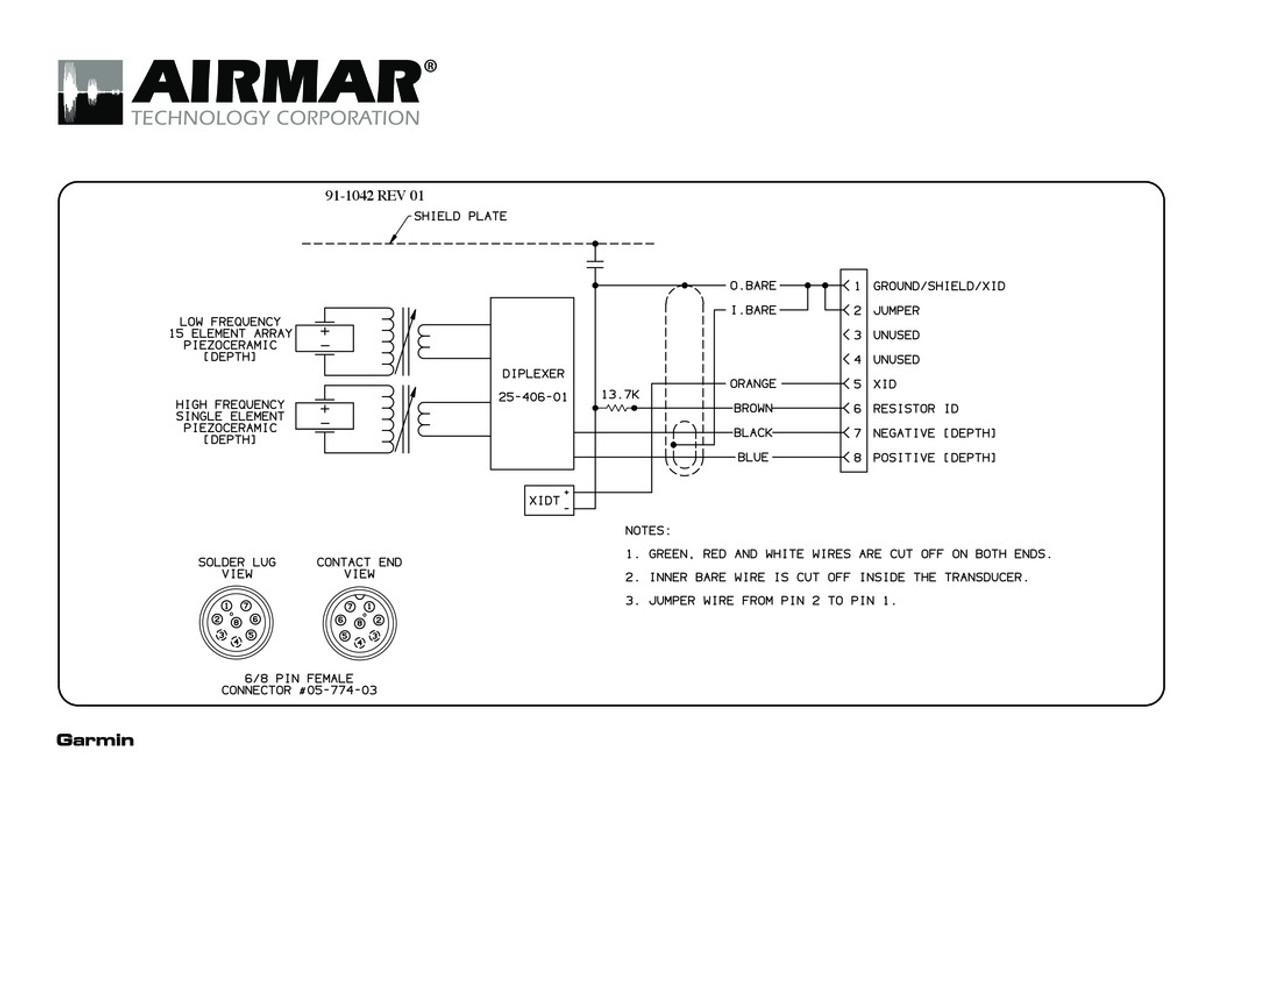 hight resolution of airmar wiring diagram garmin r199 8 pin d t blue bottle marinedepth only